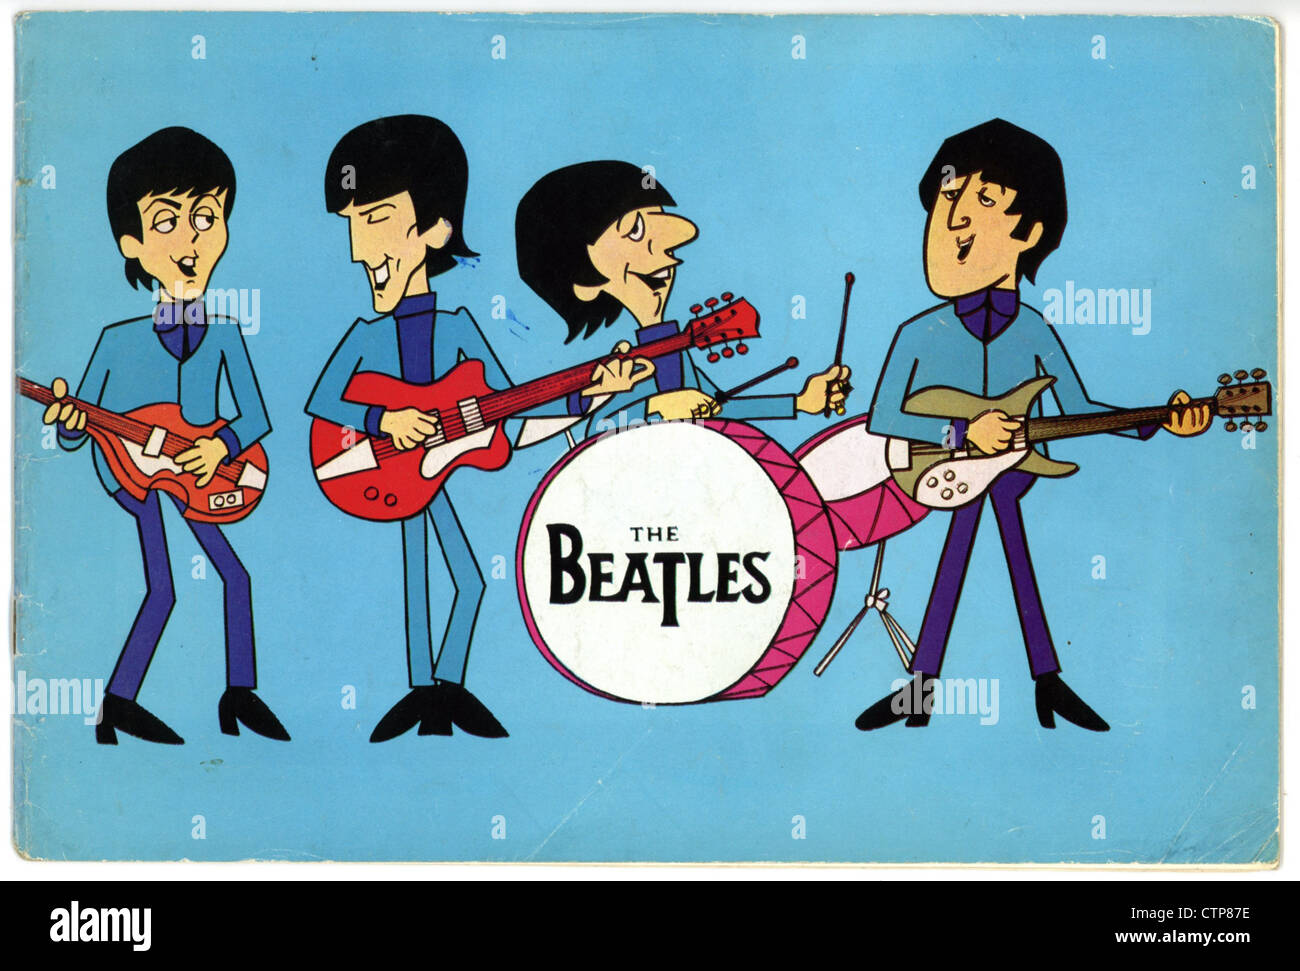 004816 - los Beatles de diciembre de 1965, Moody Blues UK Tour el programa Imagen De Stock